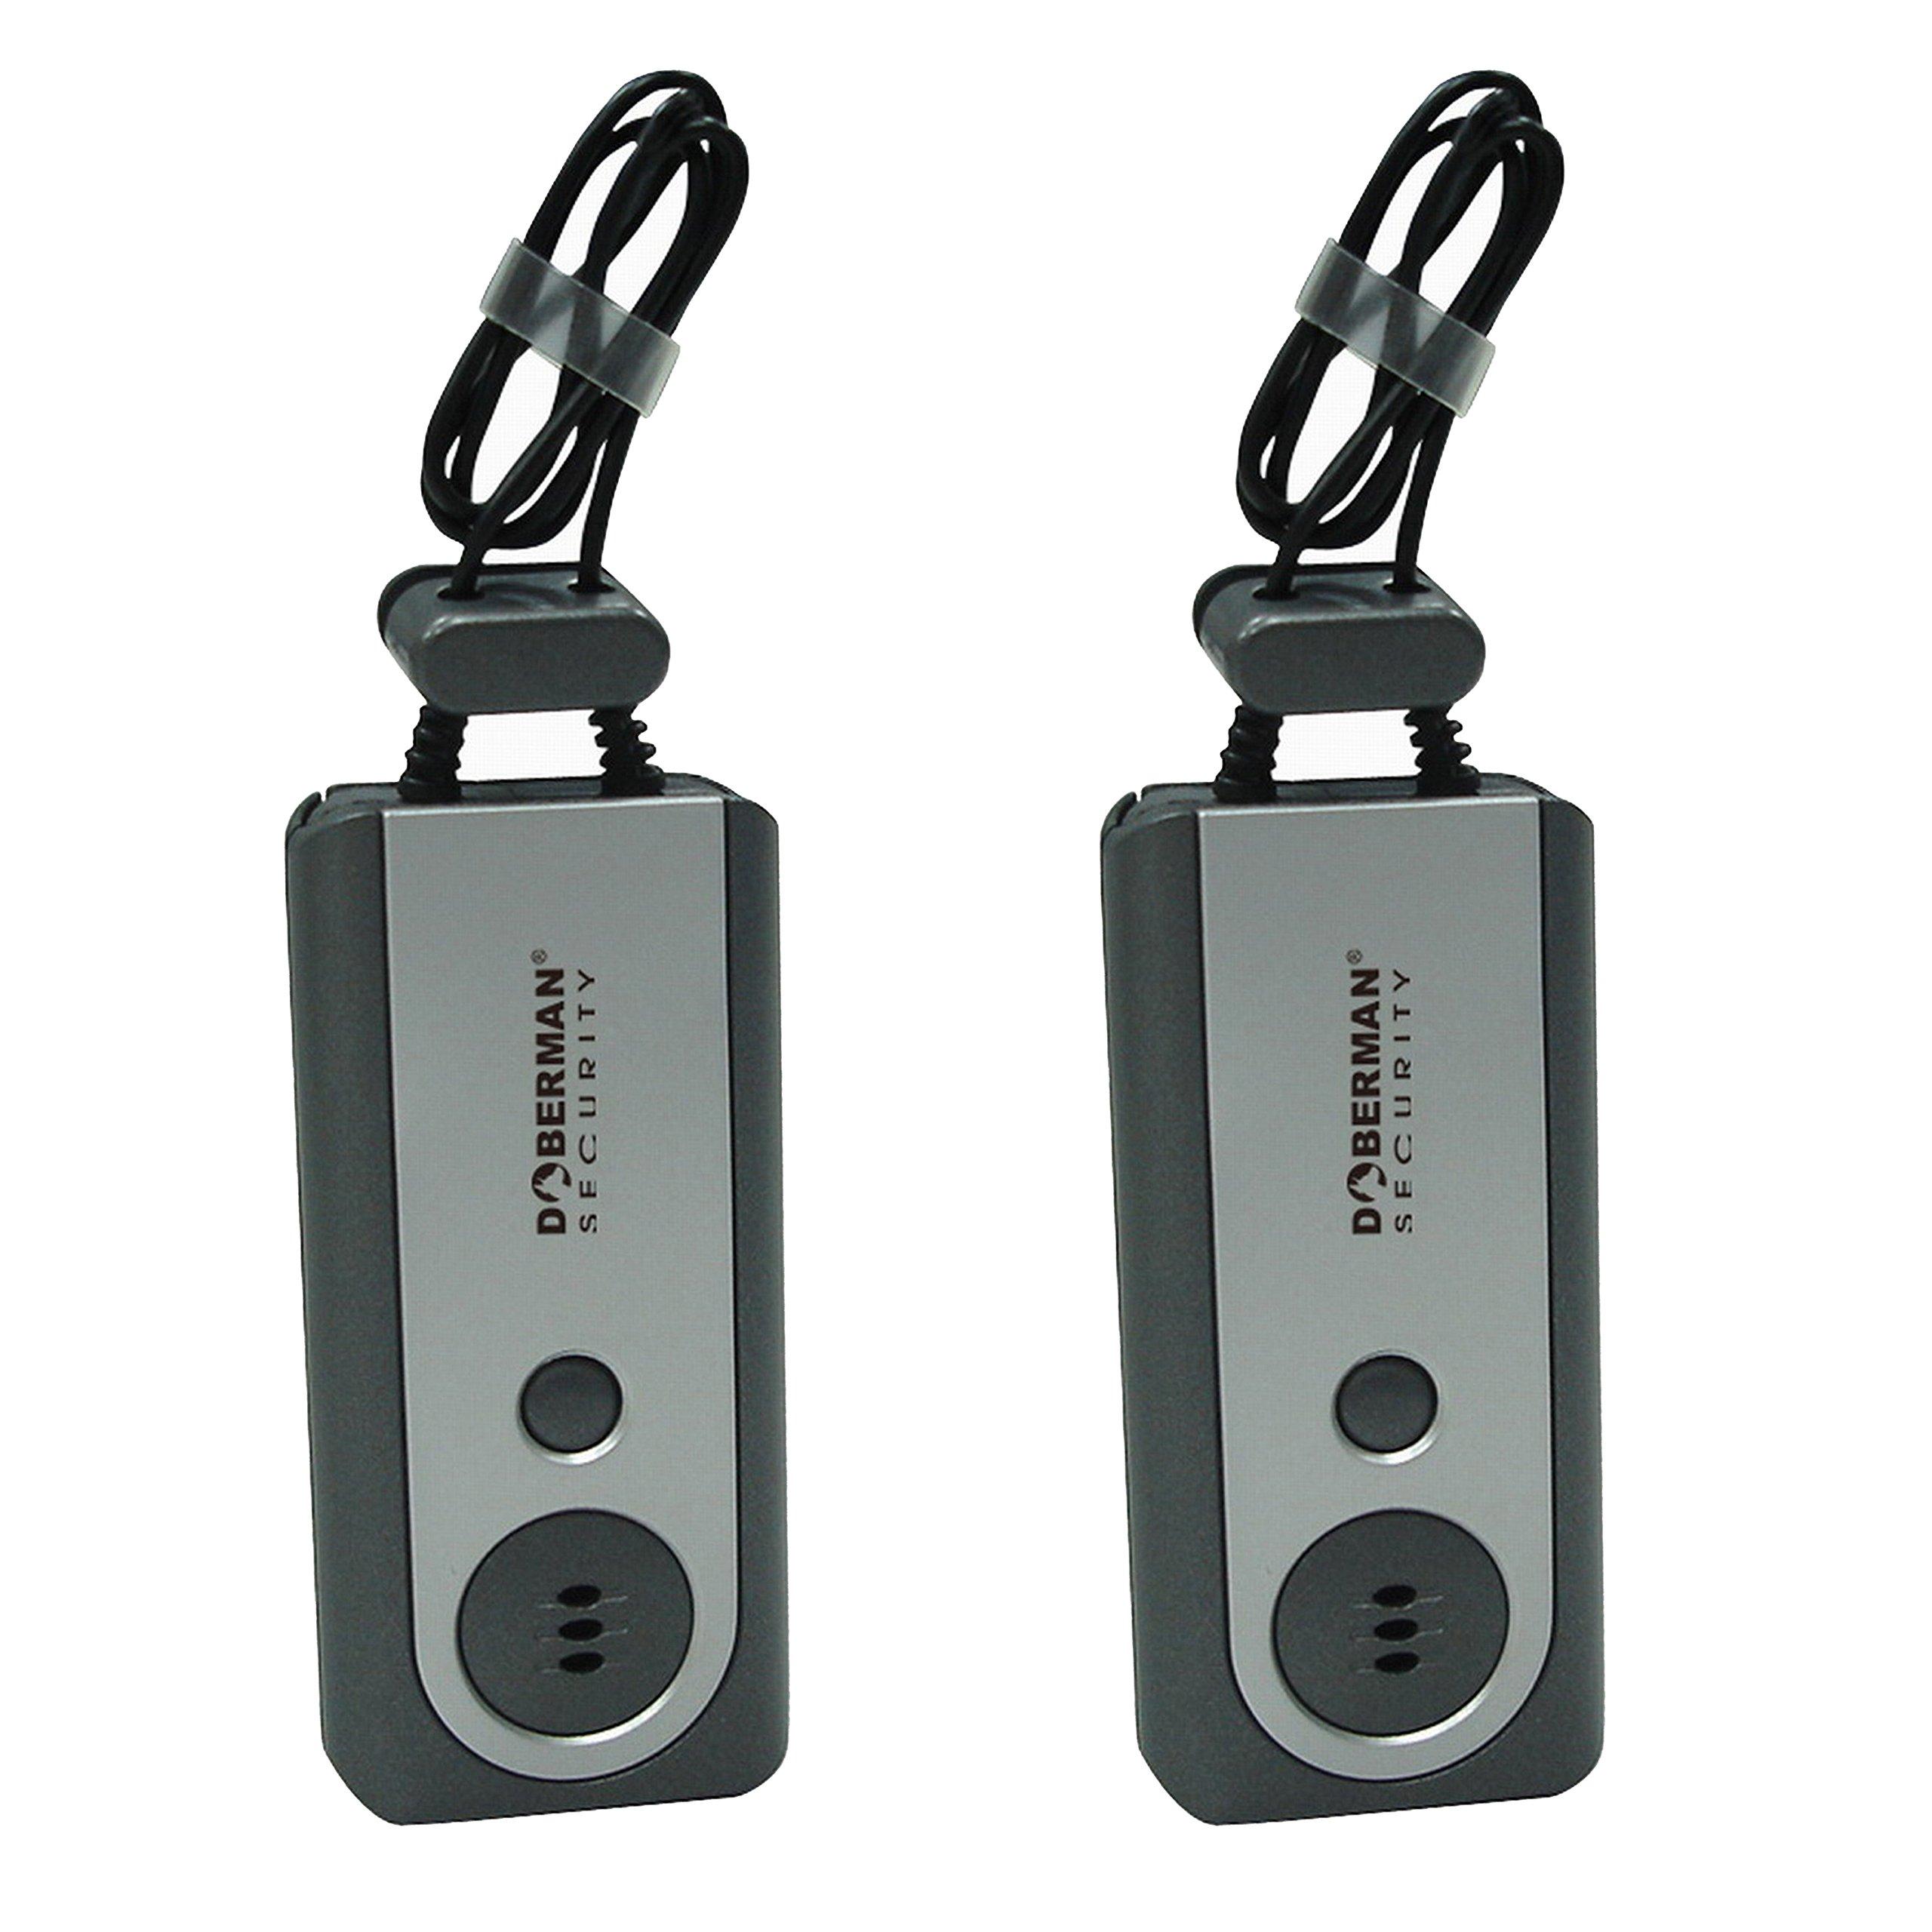 Doberman Security Portable Door Alarm with Flash Light, 2 alarms